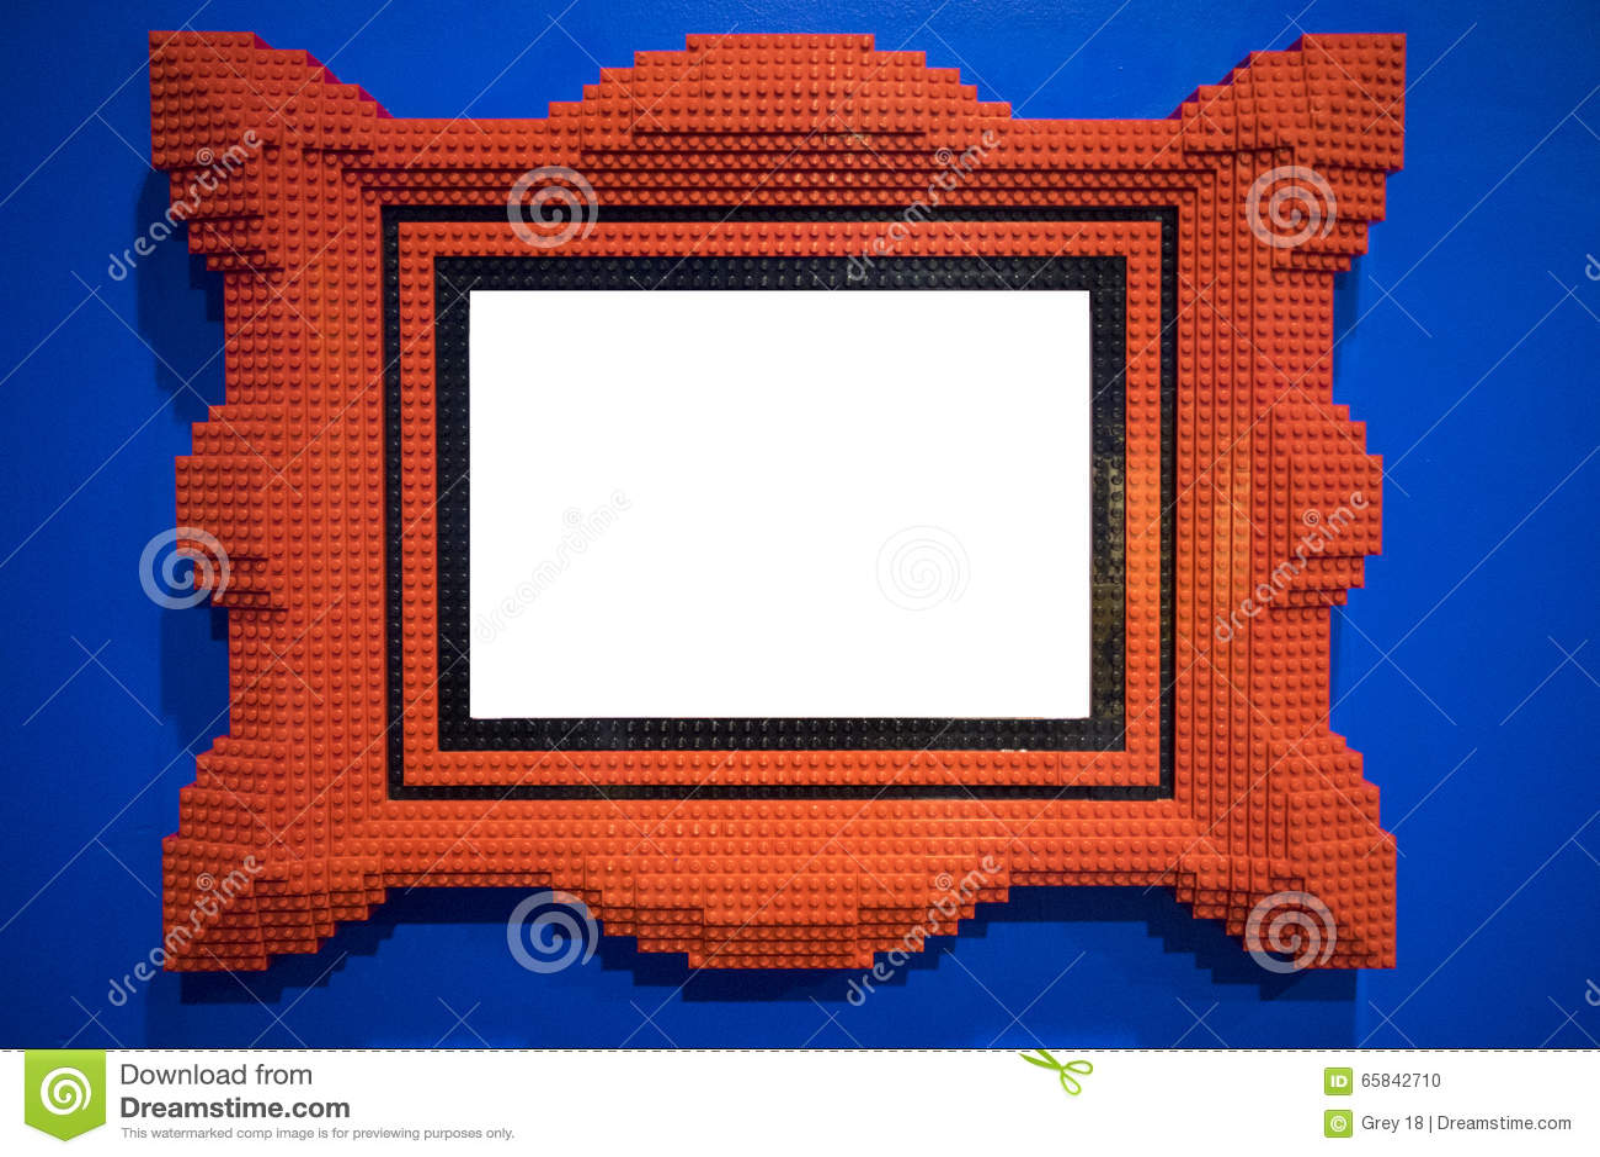 Rot blockiert Bilderrahmen stock abbildung. Illustration von ...